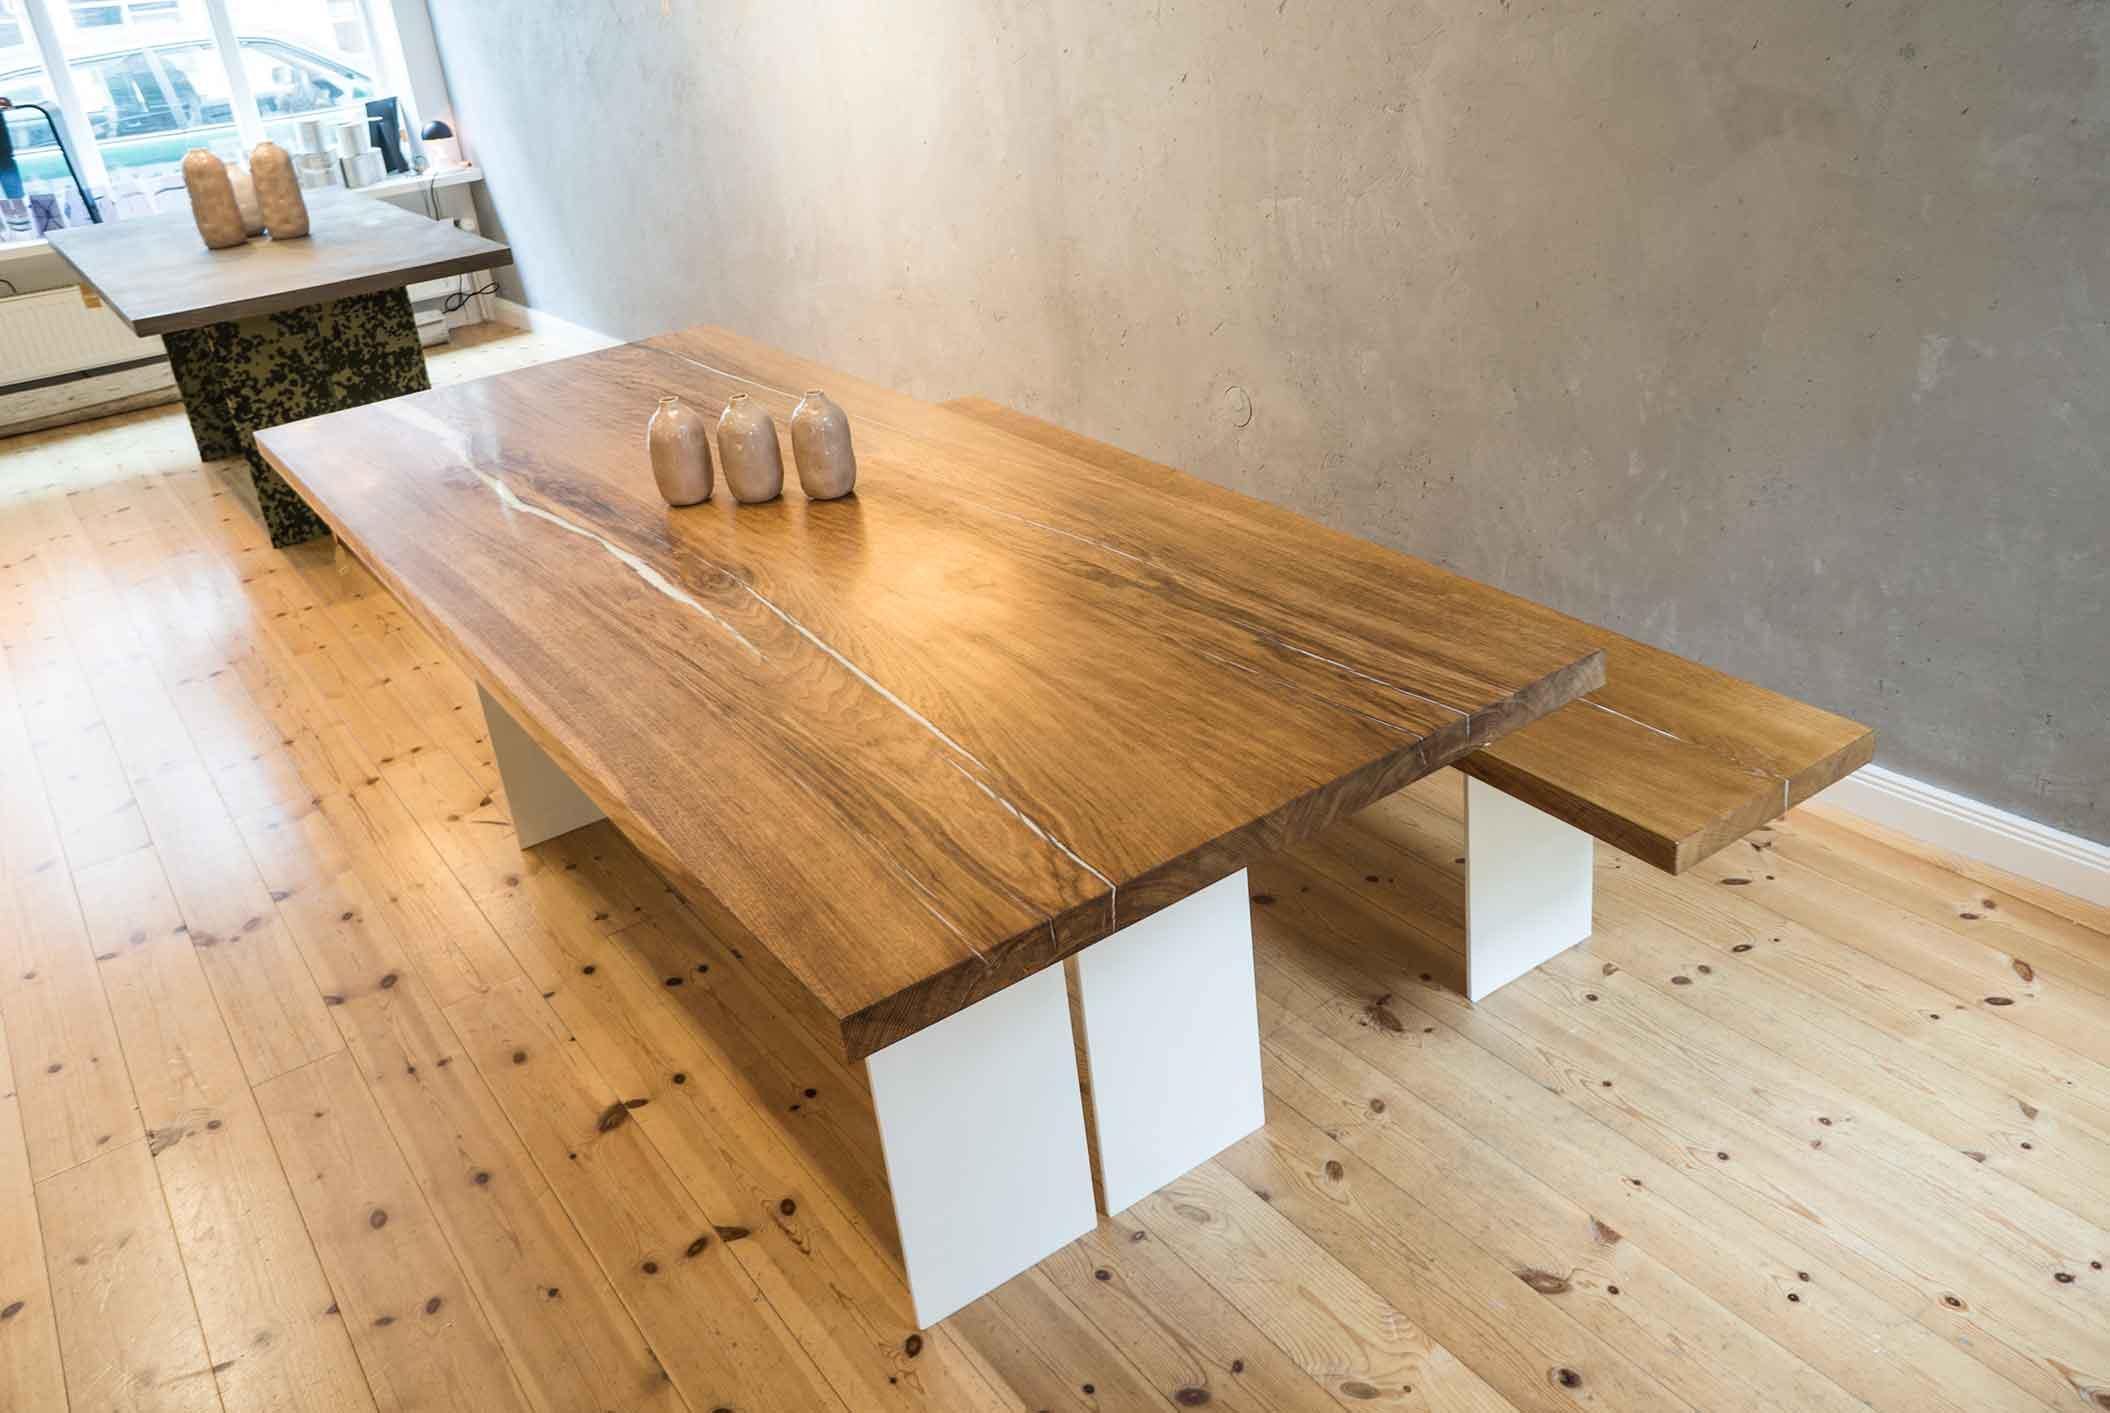 Tische & Sitzbank: Konstantin Manufaktur (Unikate) Vasen: